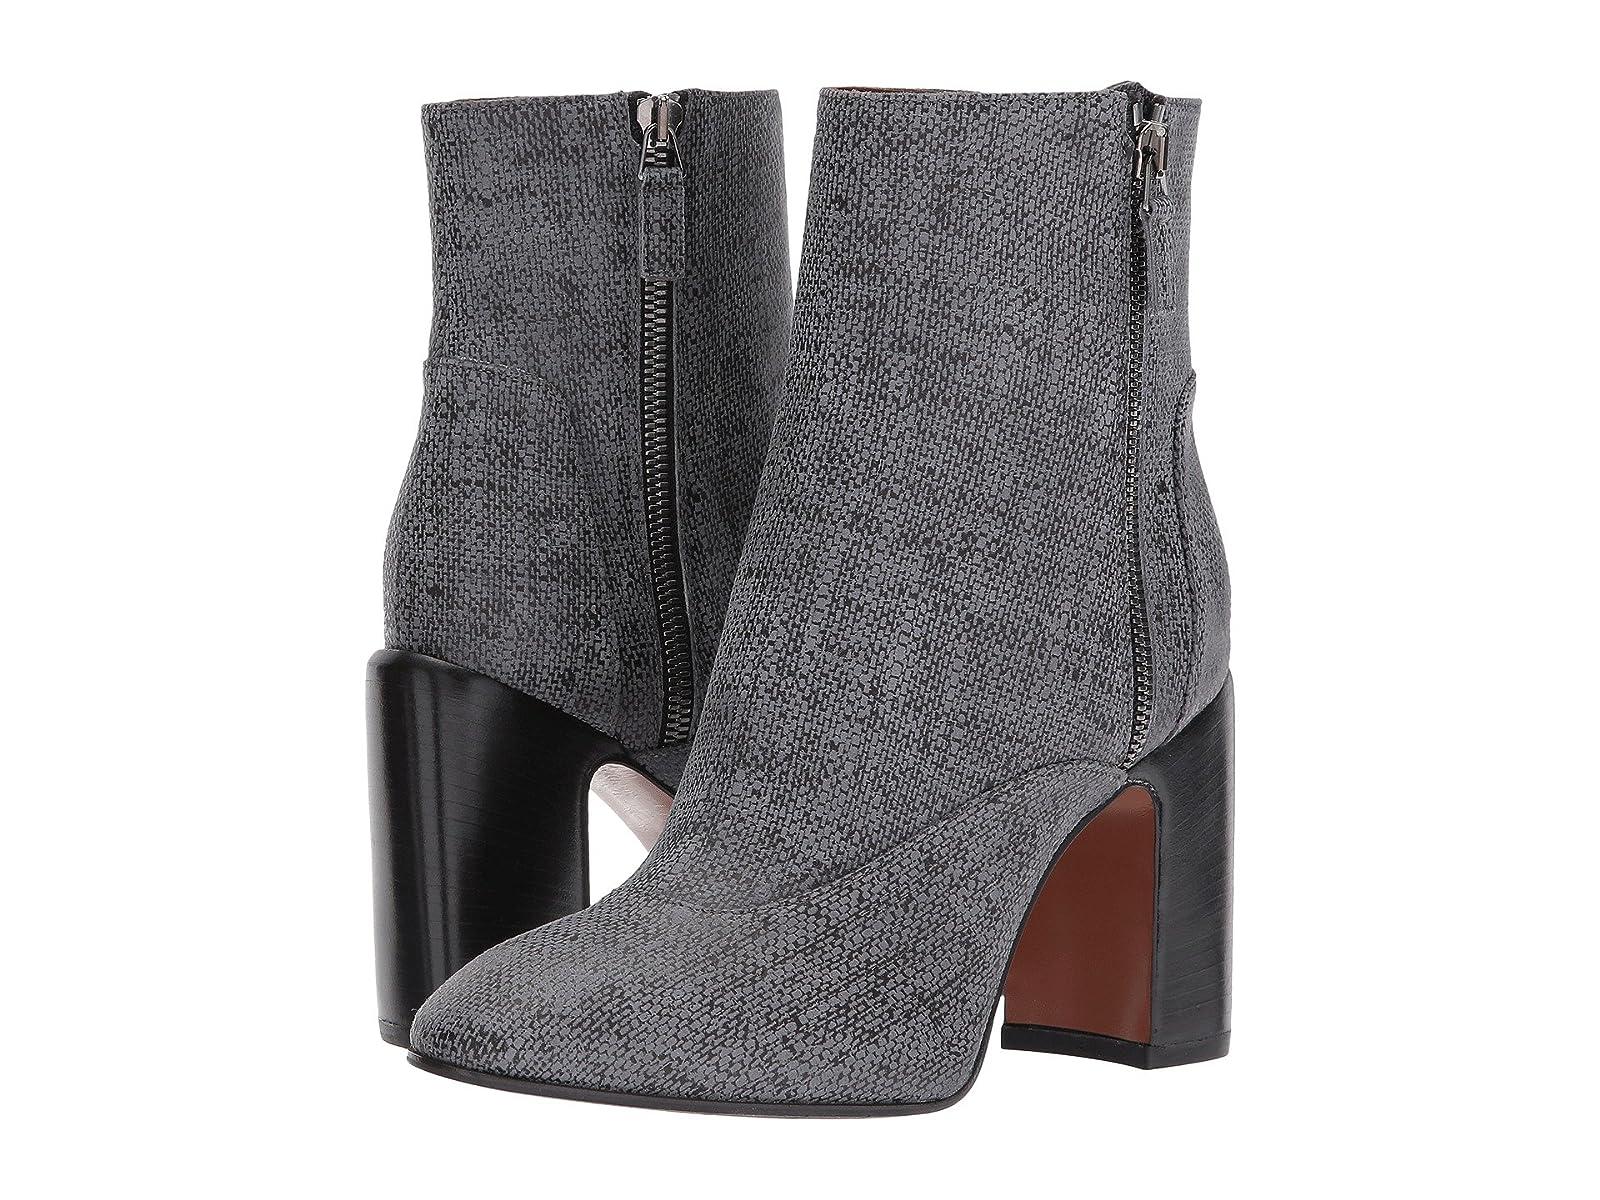 Aquatalia ElisabethCheap and distinctive eye-catching shoes